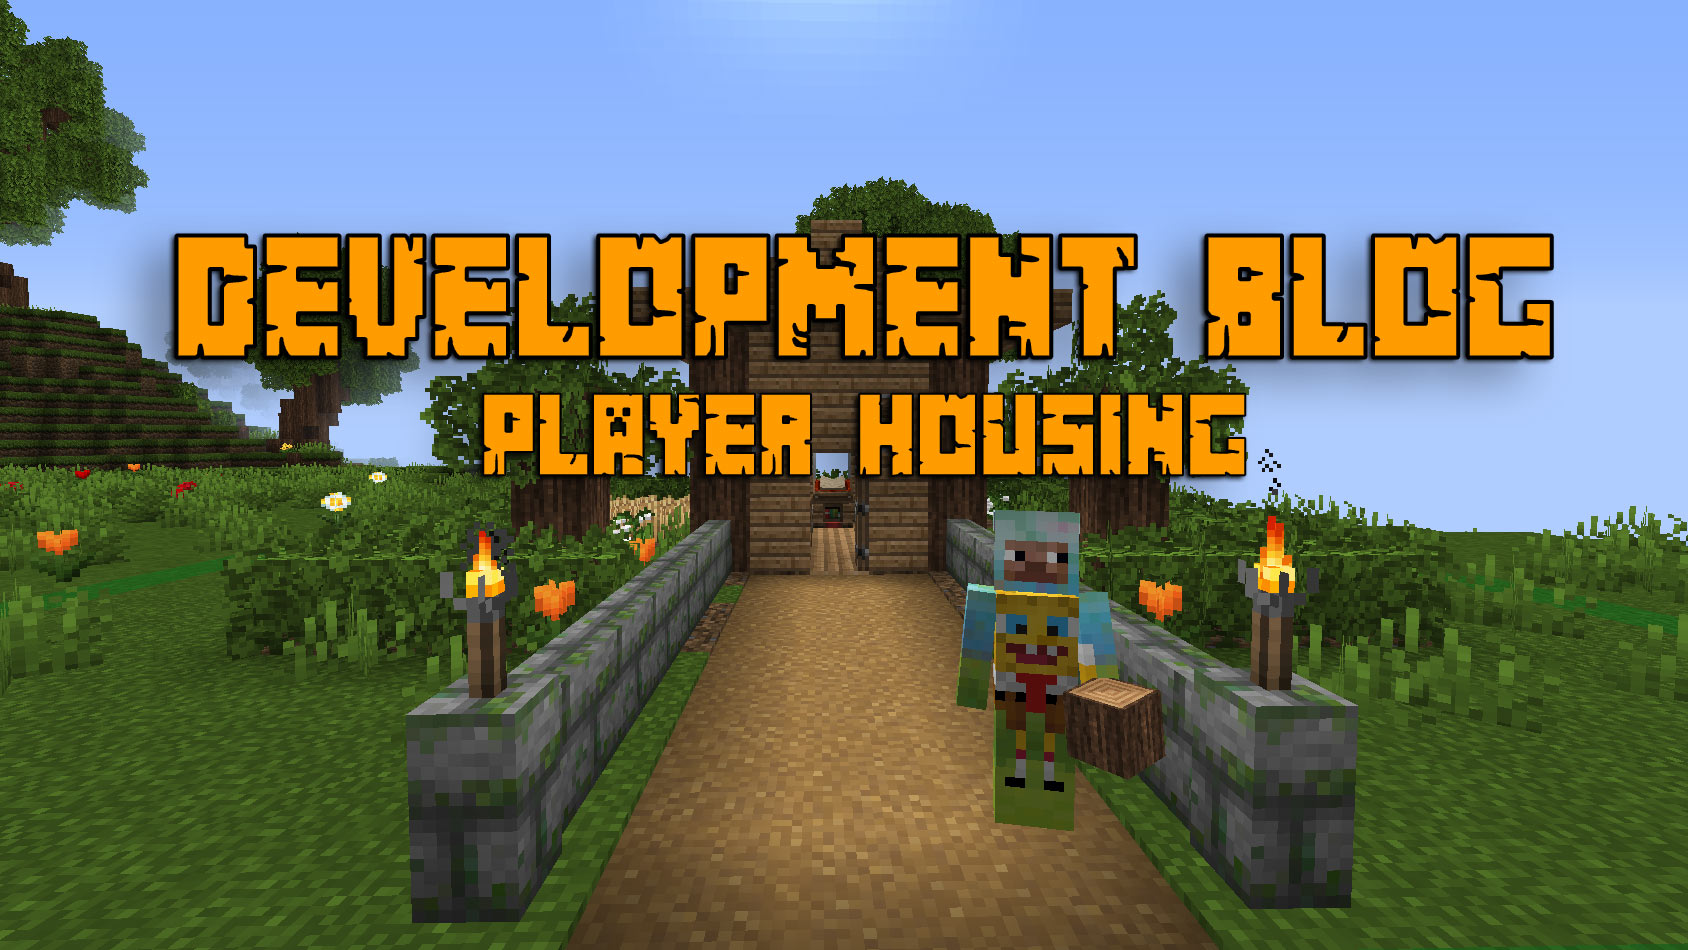 Portable Player Housing